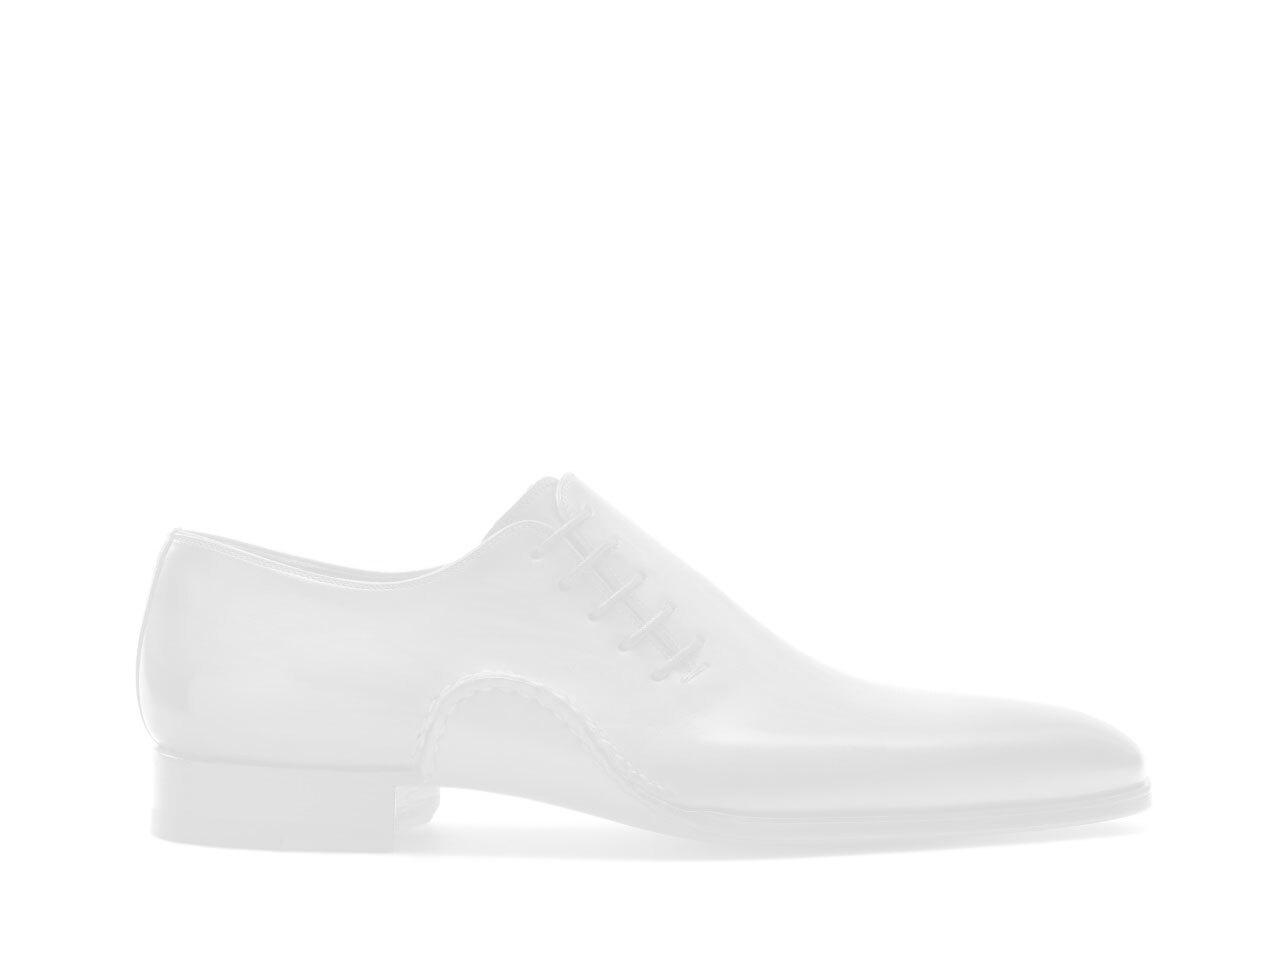 Sole of the Magnanni Gasol Black Men's Sneakers